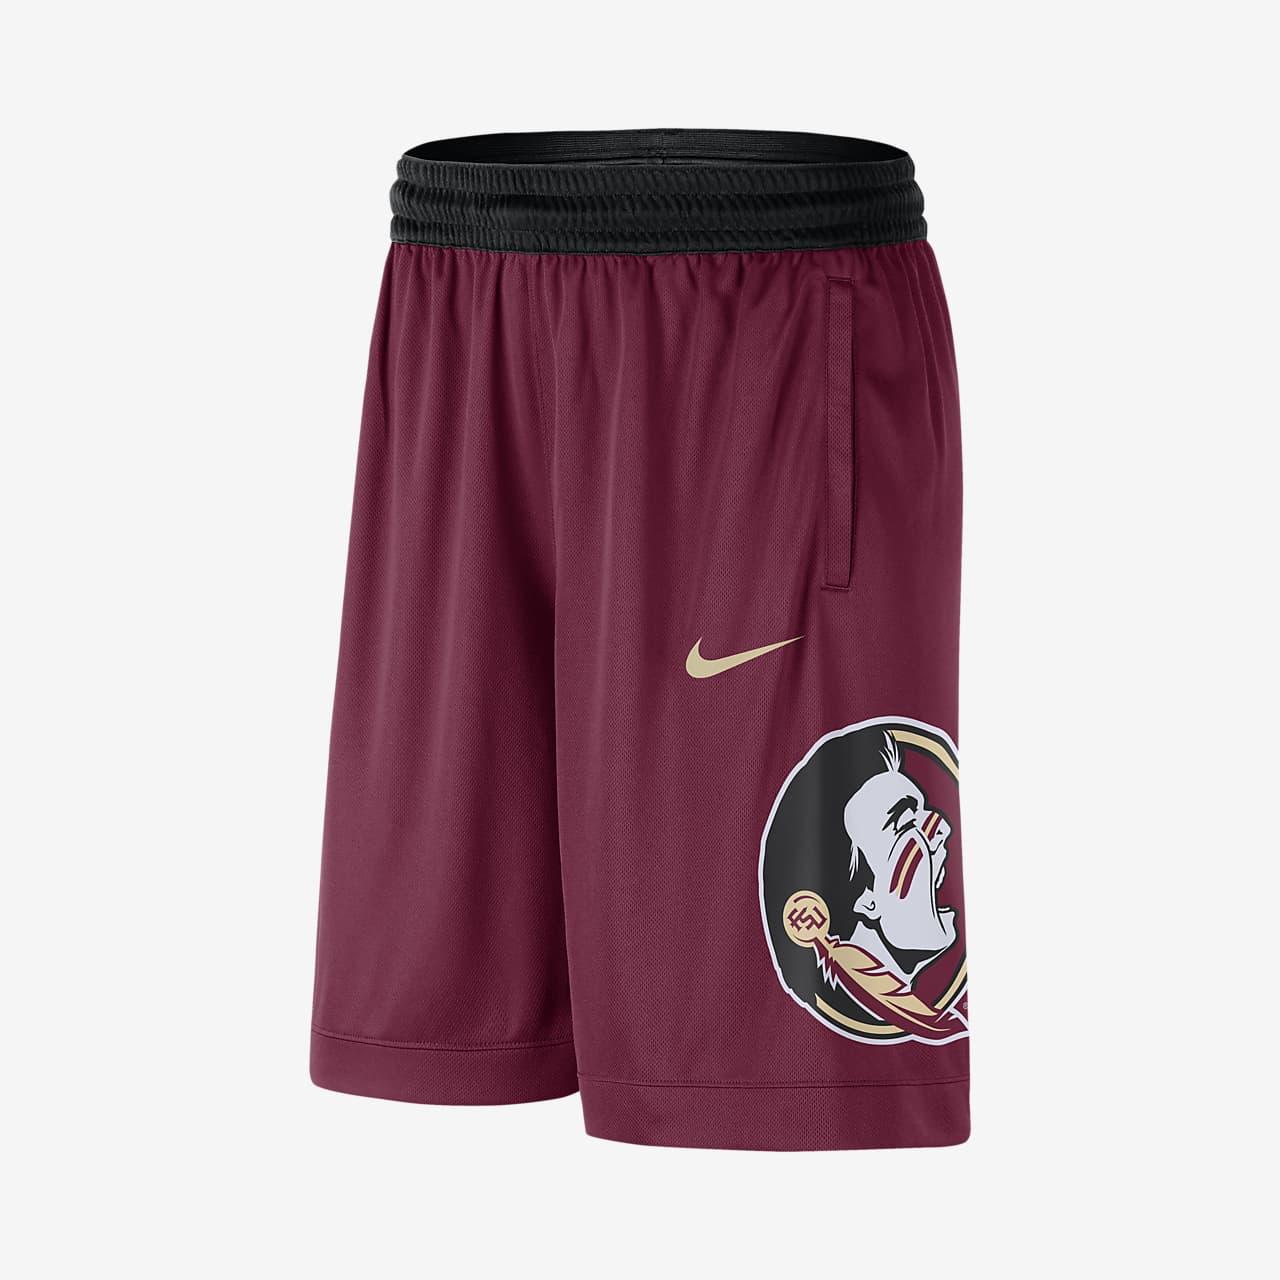 Nike College Dri-FIT (Florida State) Men's Basketball Shorts